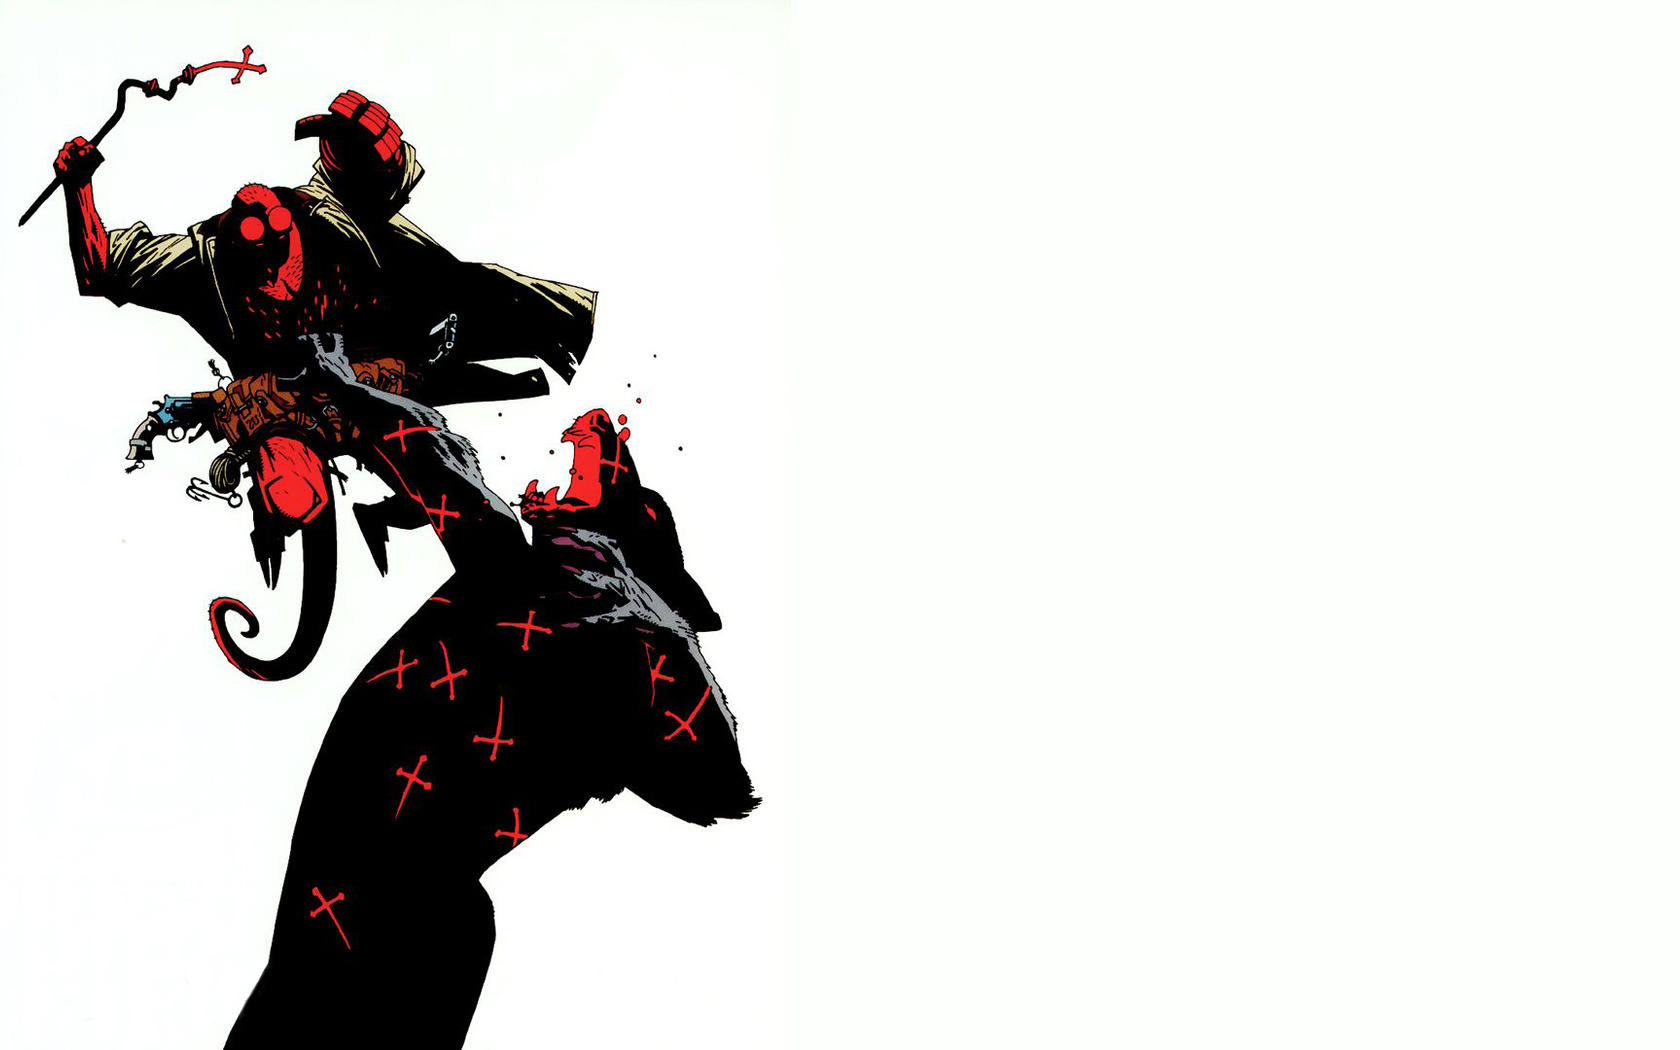 Hellboy wallpaper 17994 1680x1050